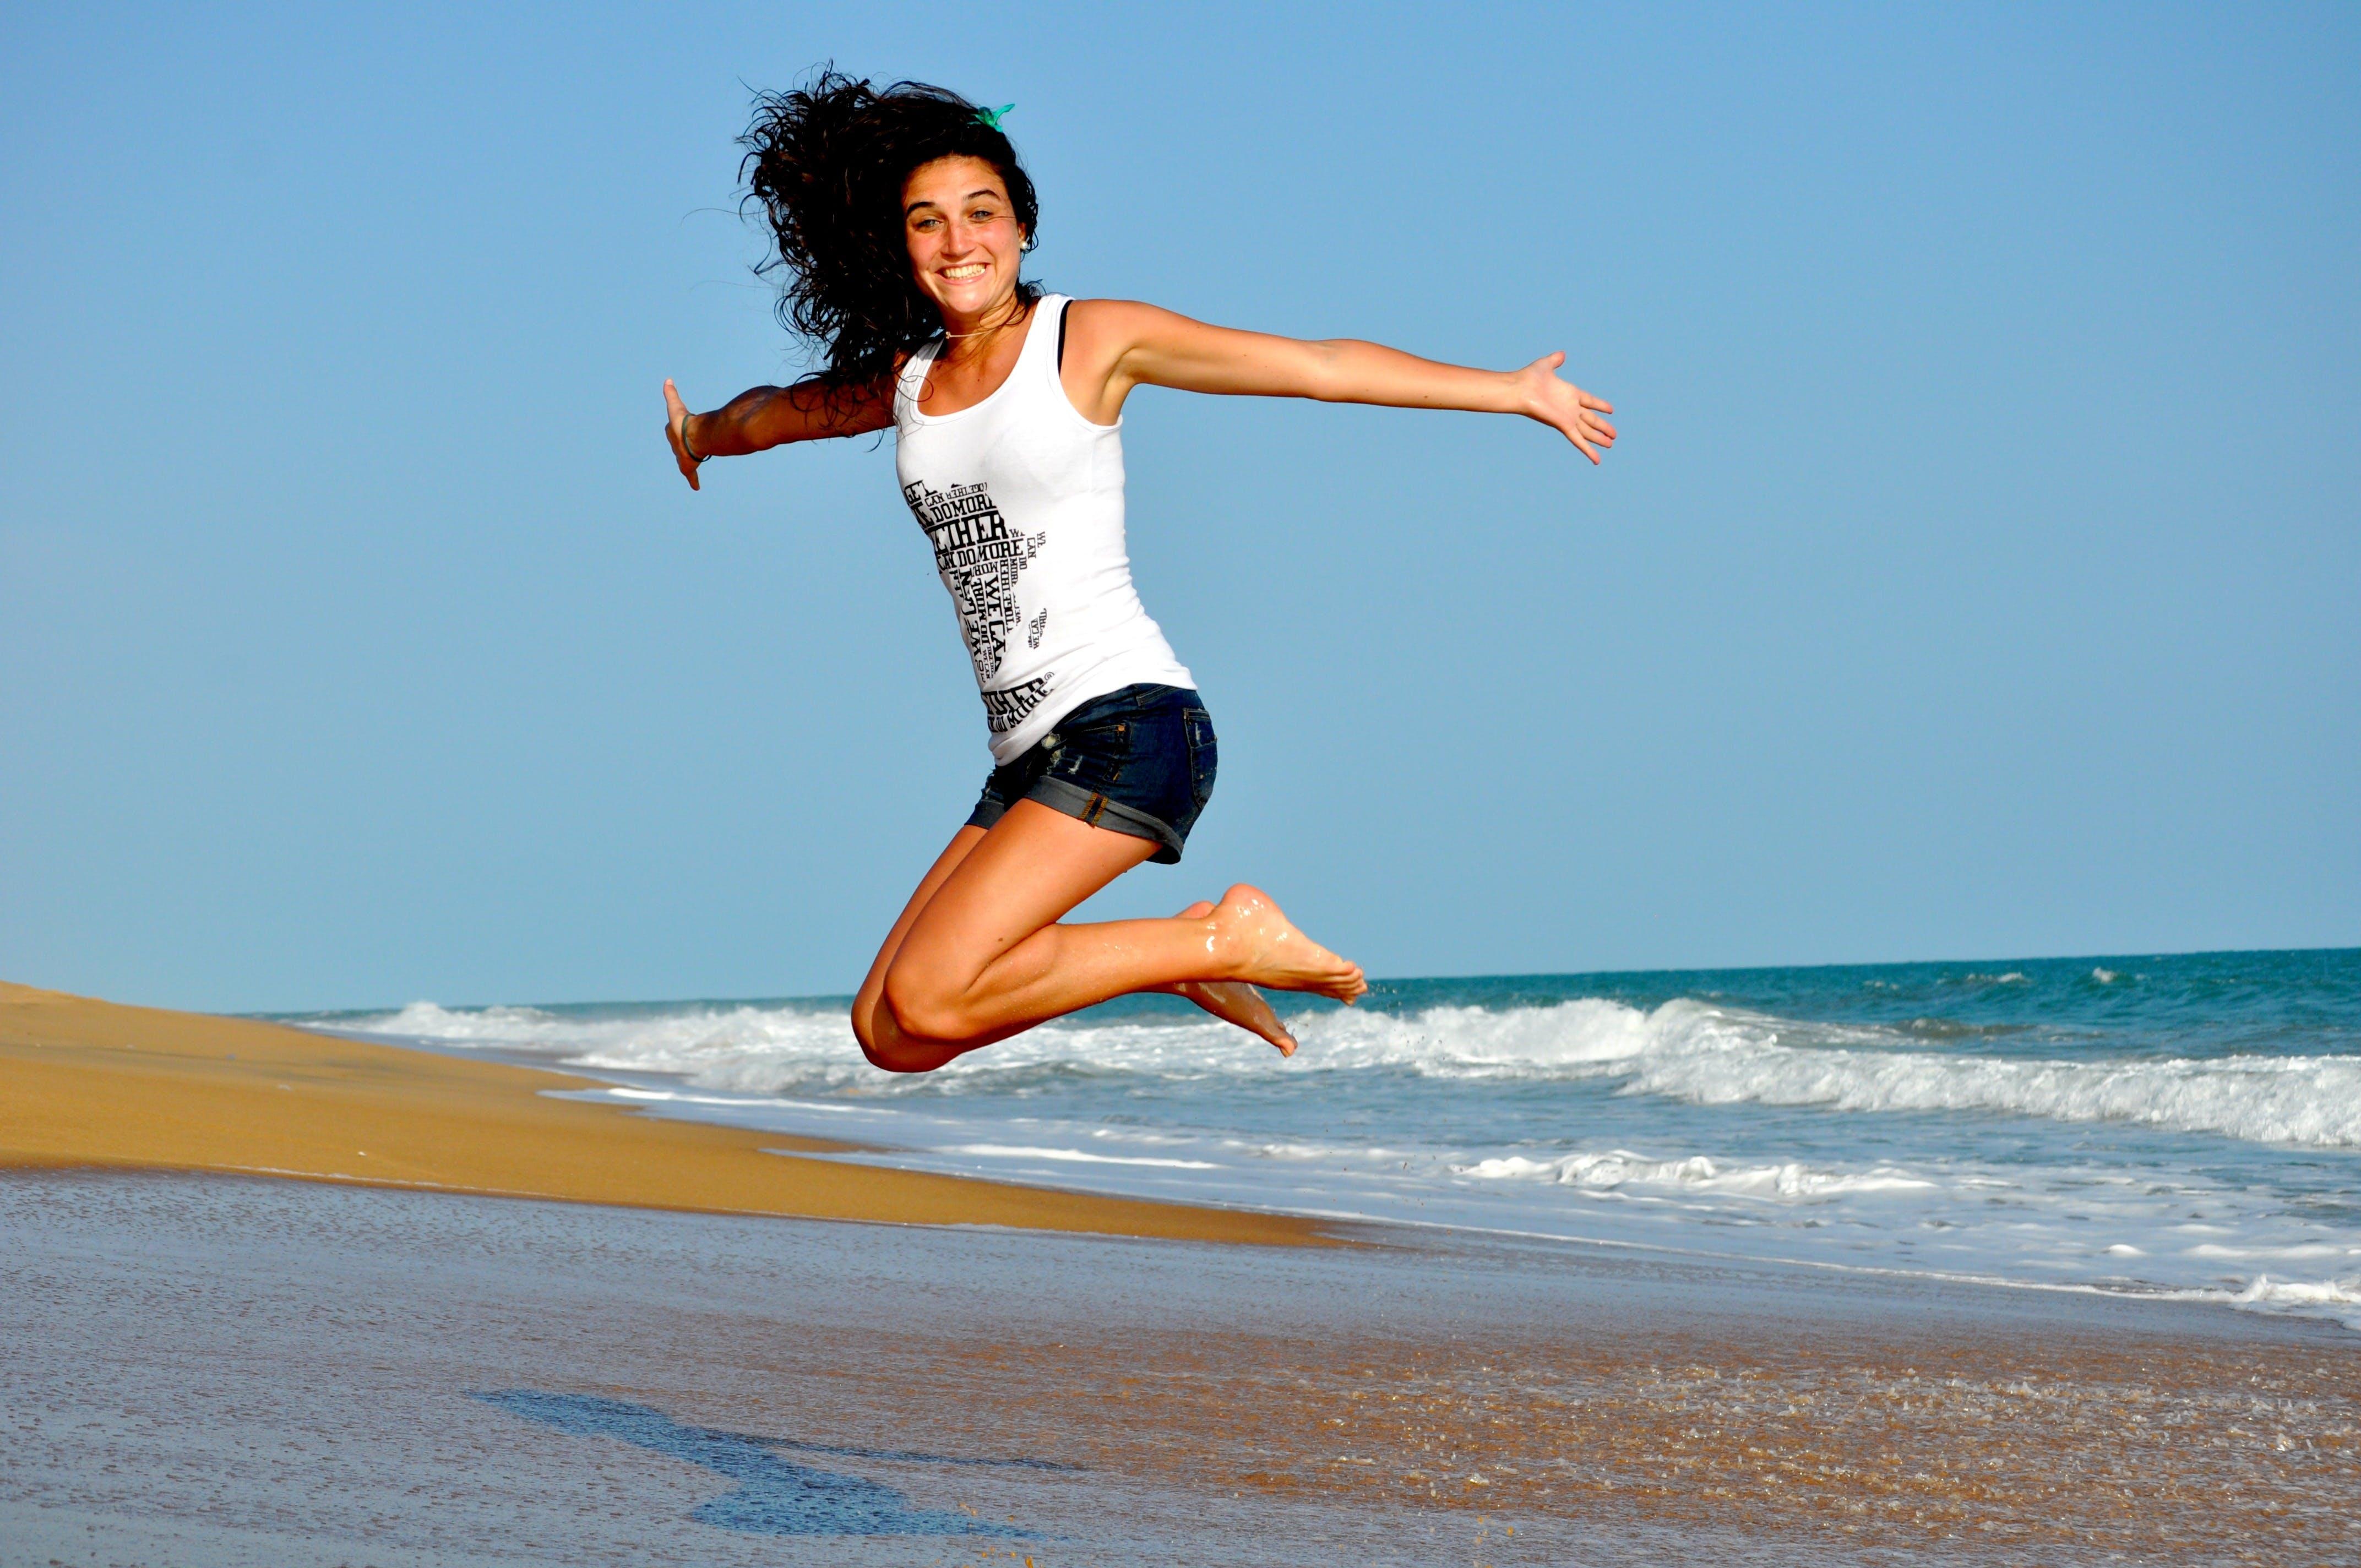 Woman in White Tanktop Jump over Beach Sand